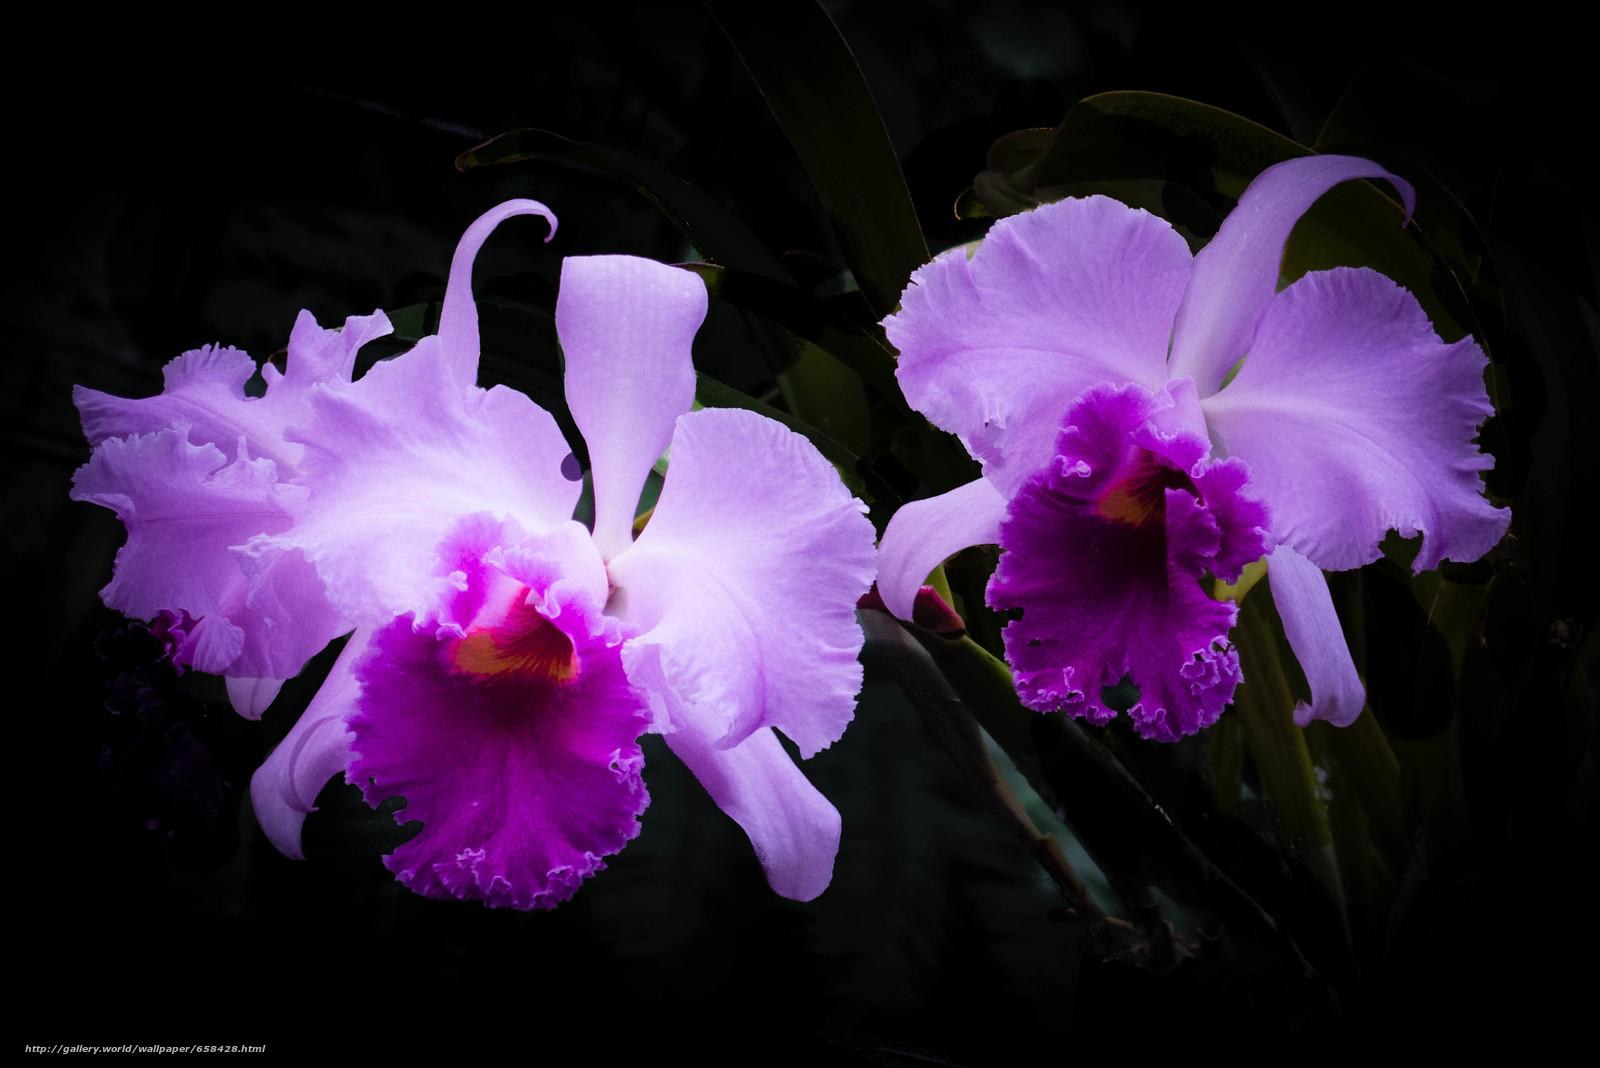 Download wallpaper flower,  Flowers,  flora free desktop wallpaper in the resolution 2900x1935 — picture №658428